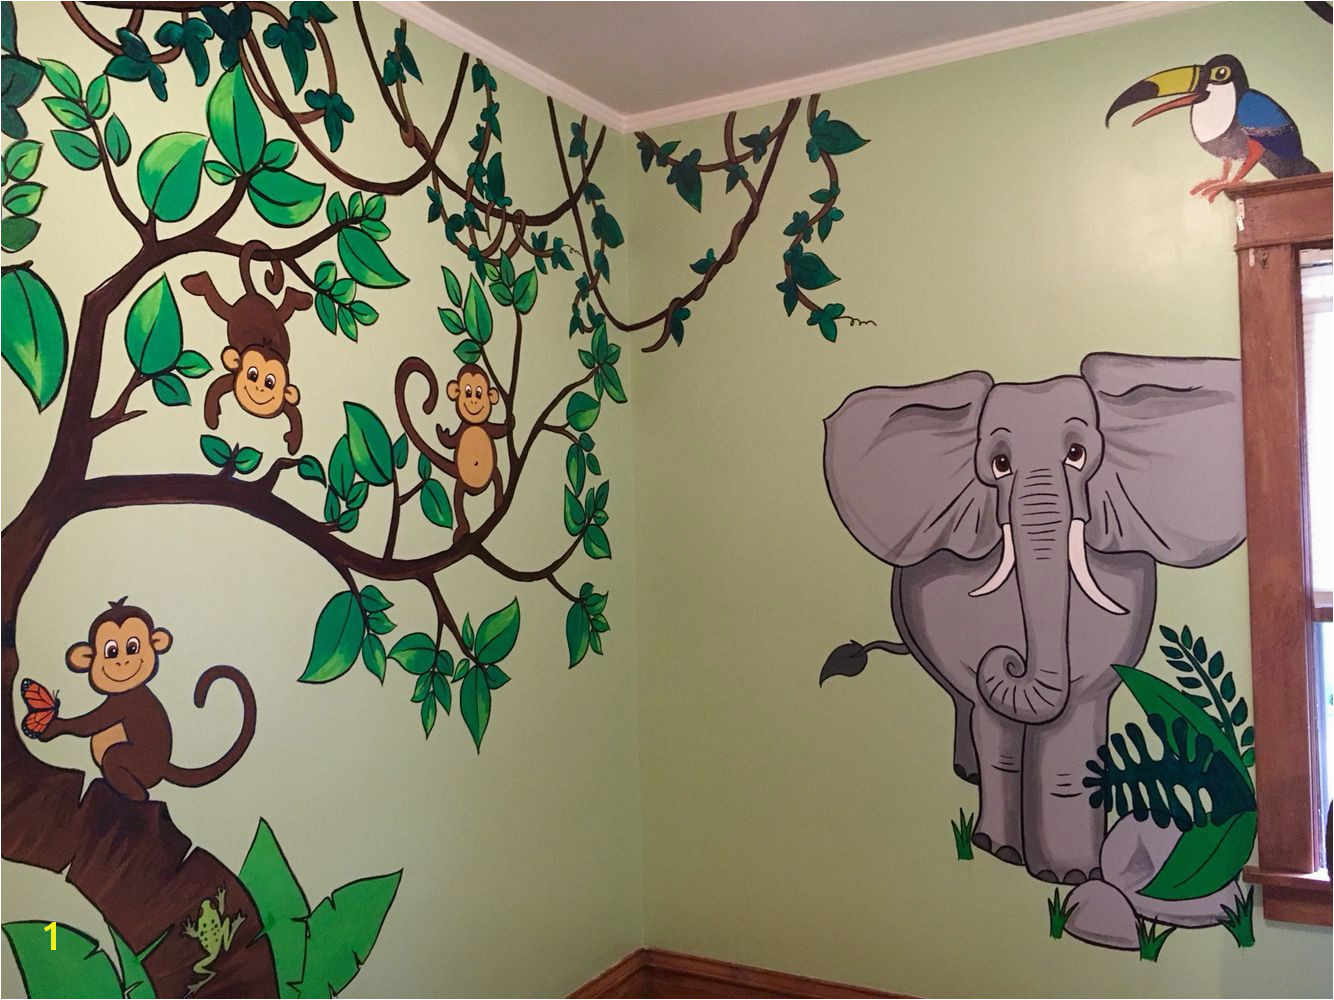 Monkeys elephant kids jungle themed room wall murals painting kids room nursery